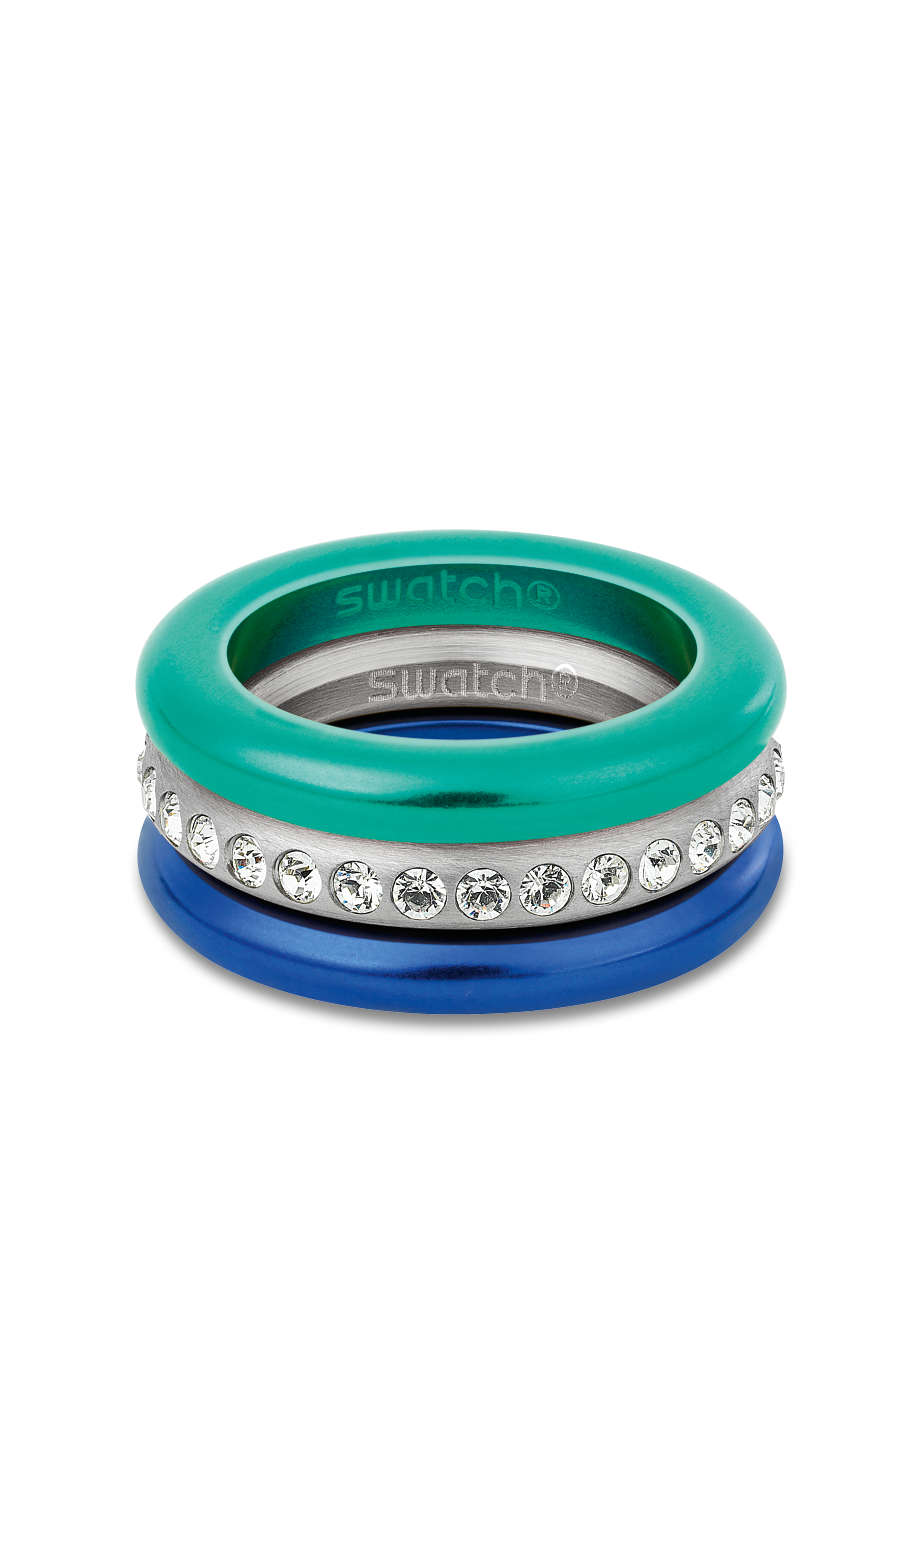 Swatch - MERRY BLUE - 1